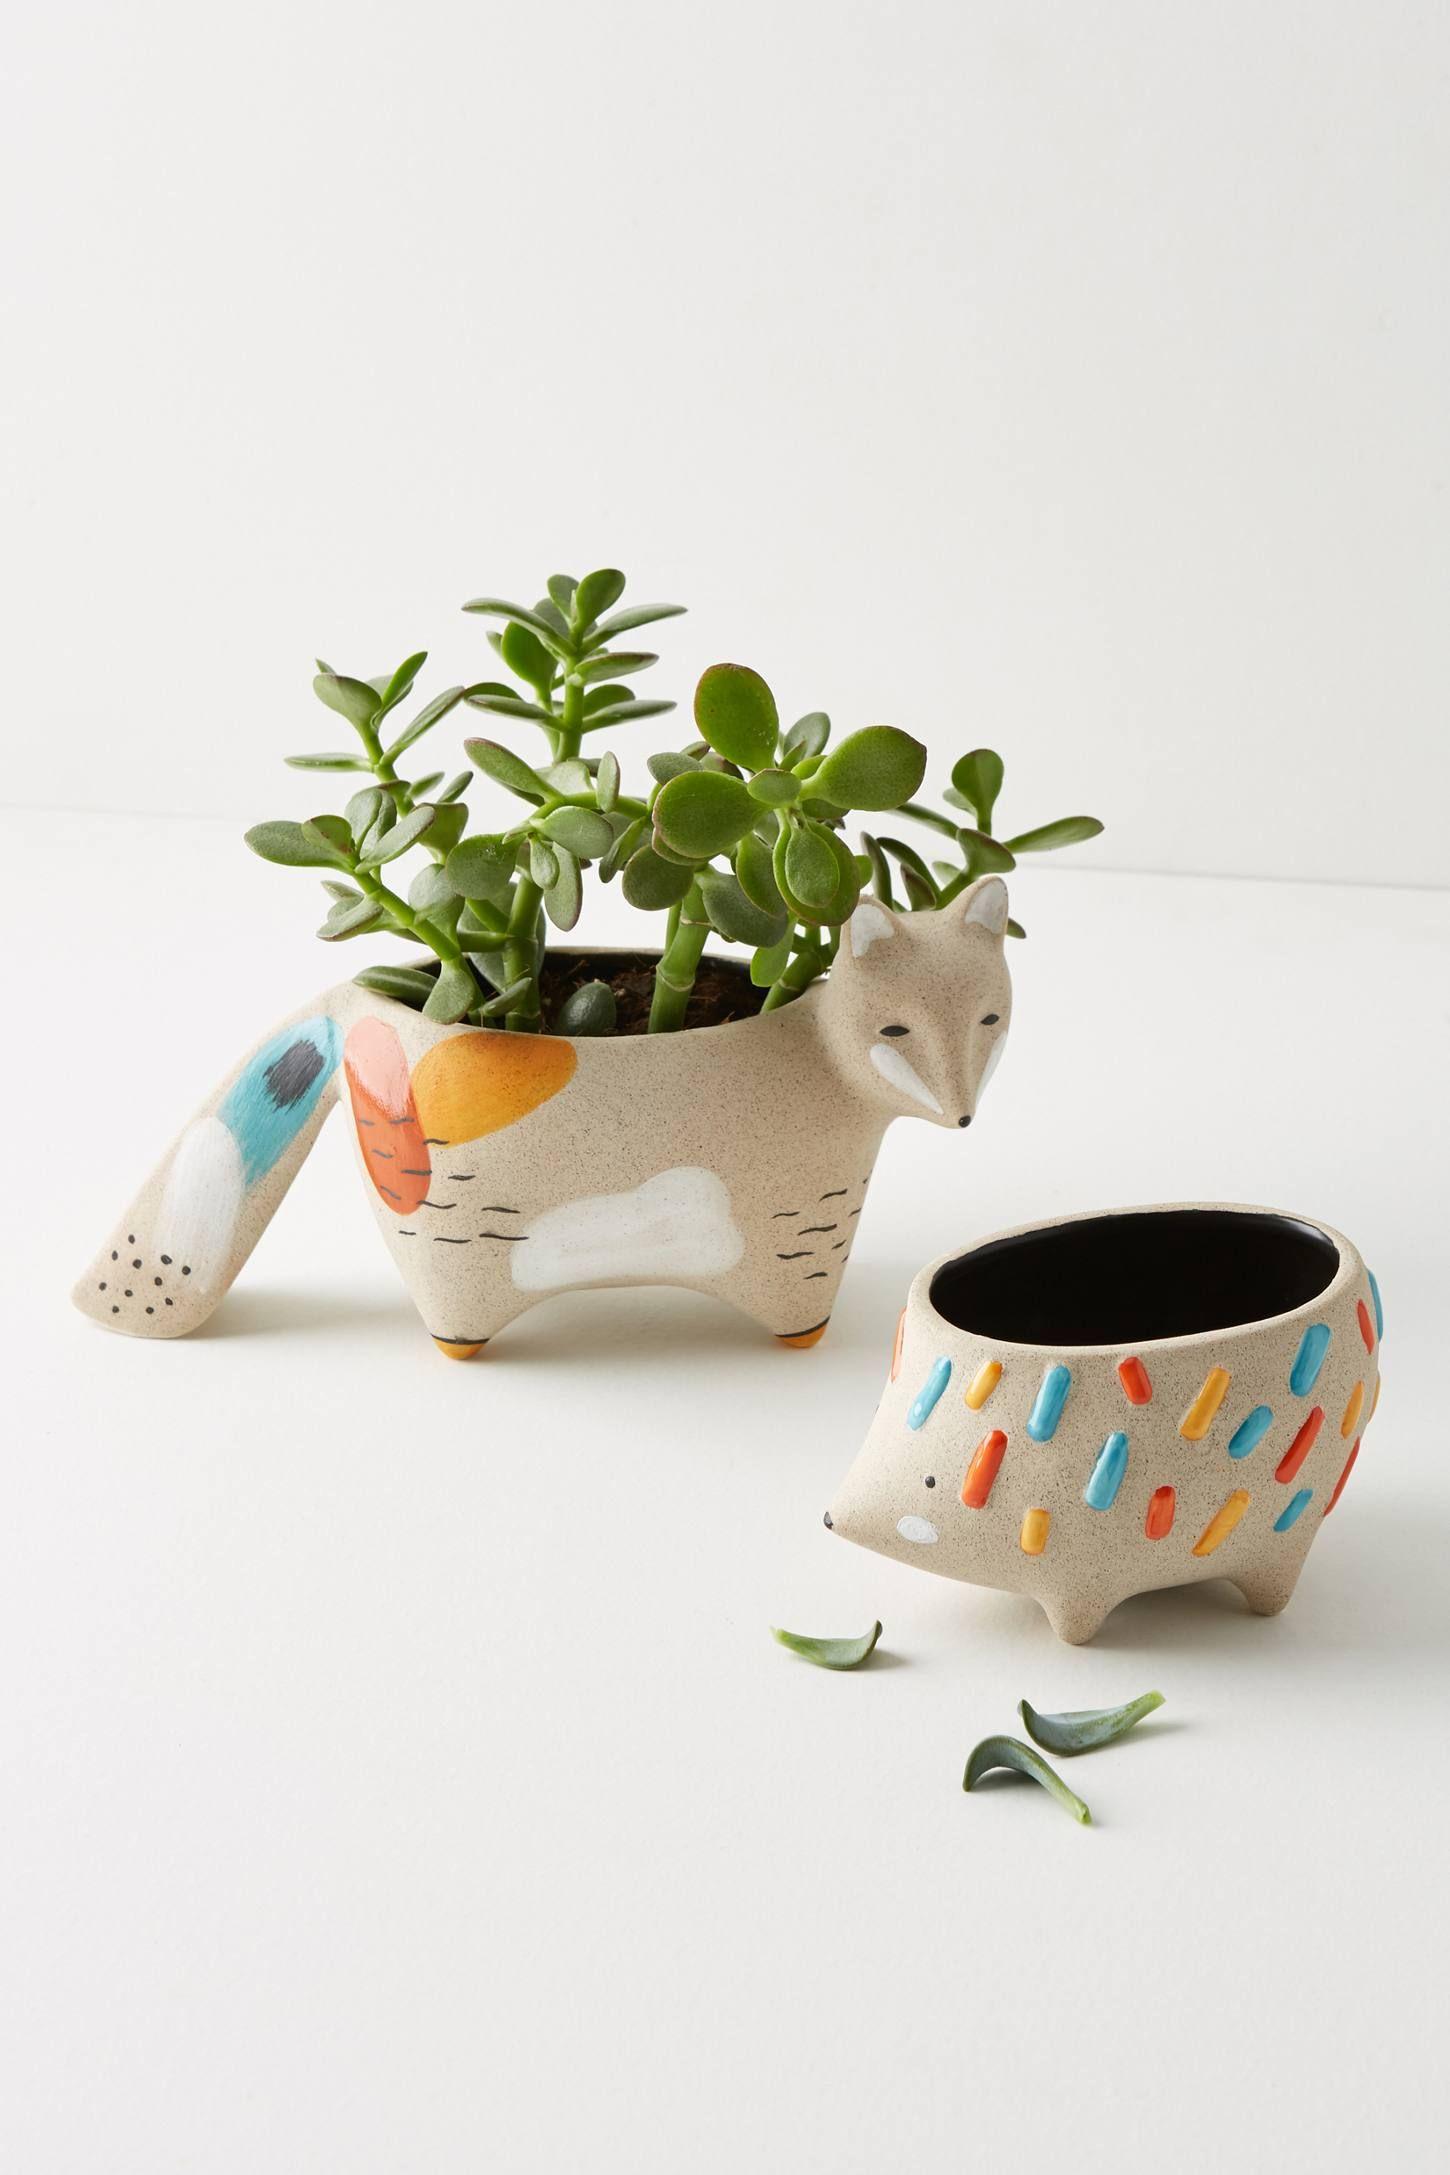 Woodland Animal Pot Woodland Animal Gifts Pottery Plant Pots